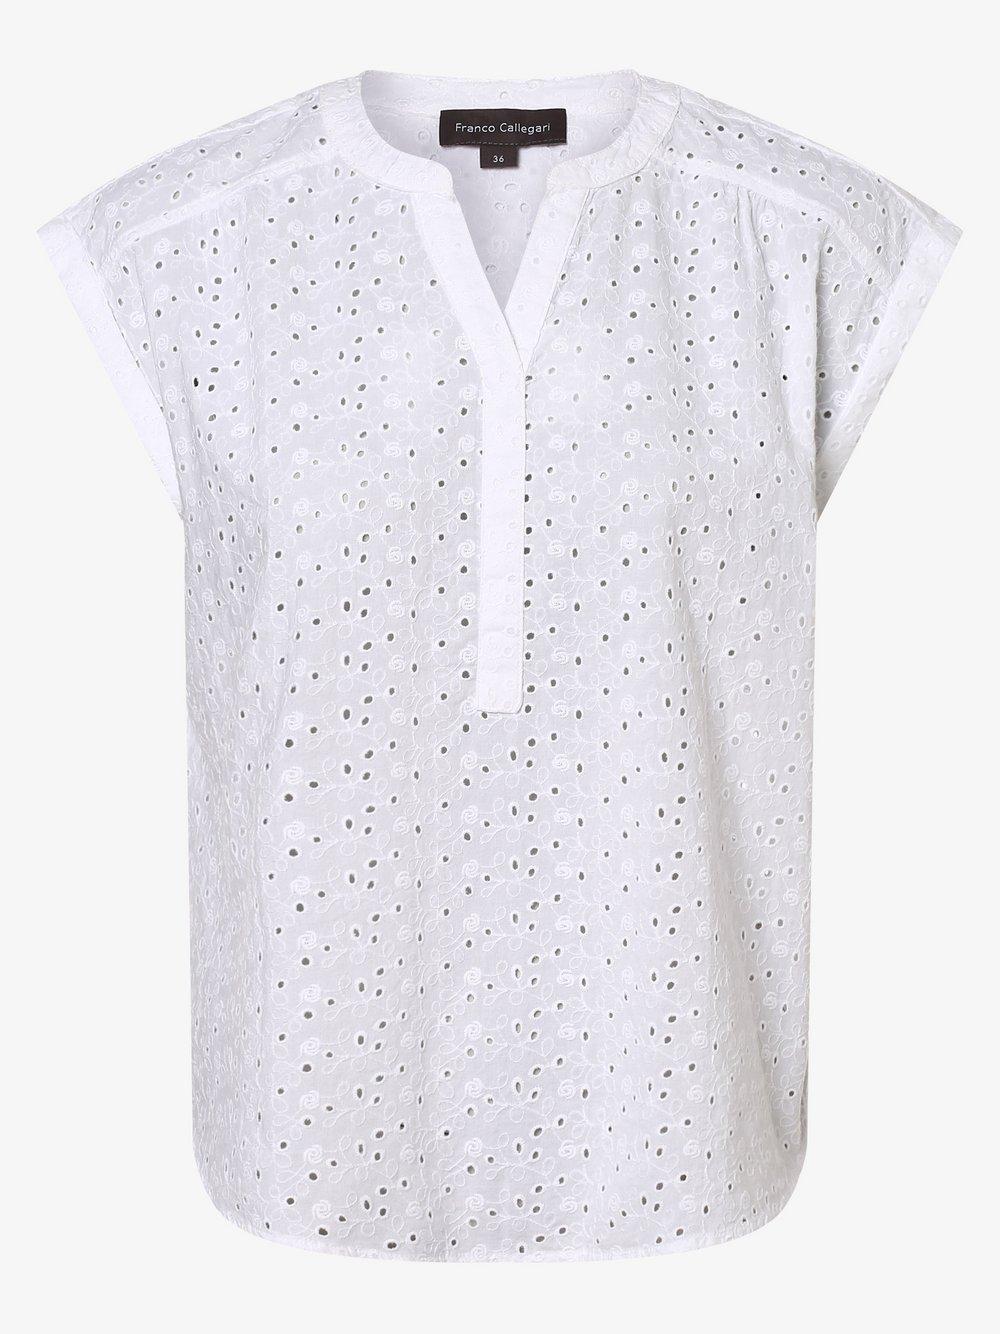 Franco Callegari – Bluzka damska, biały Van Graaf 440715-0009-00420